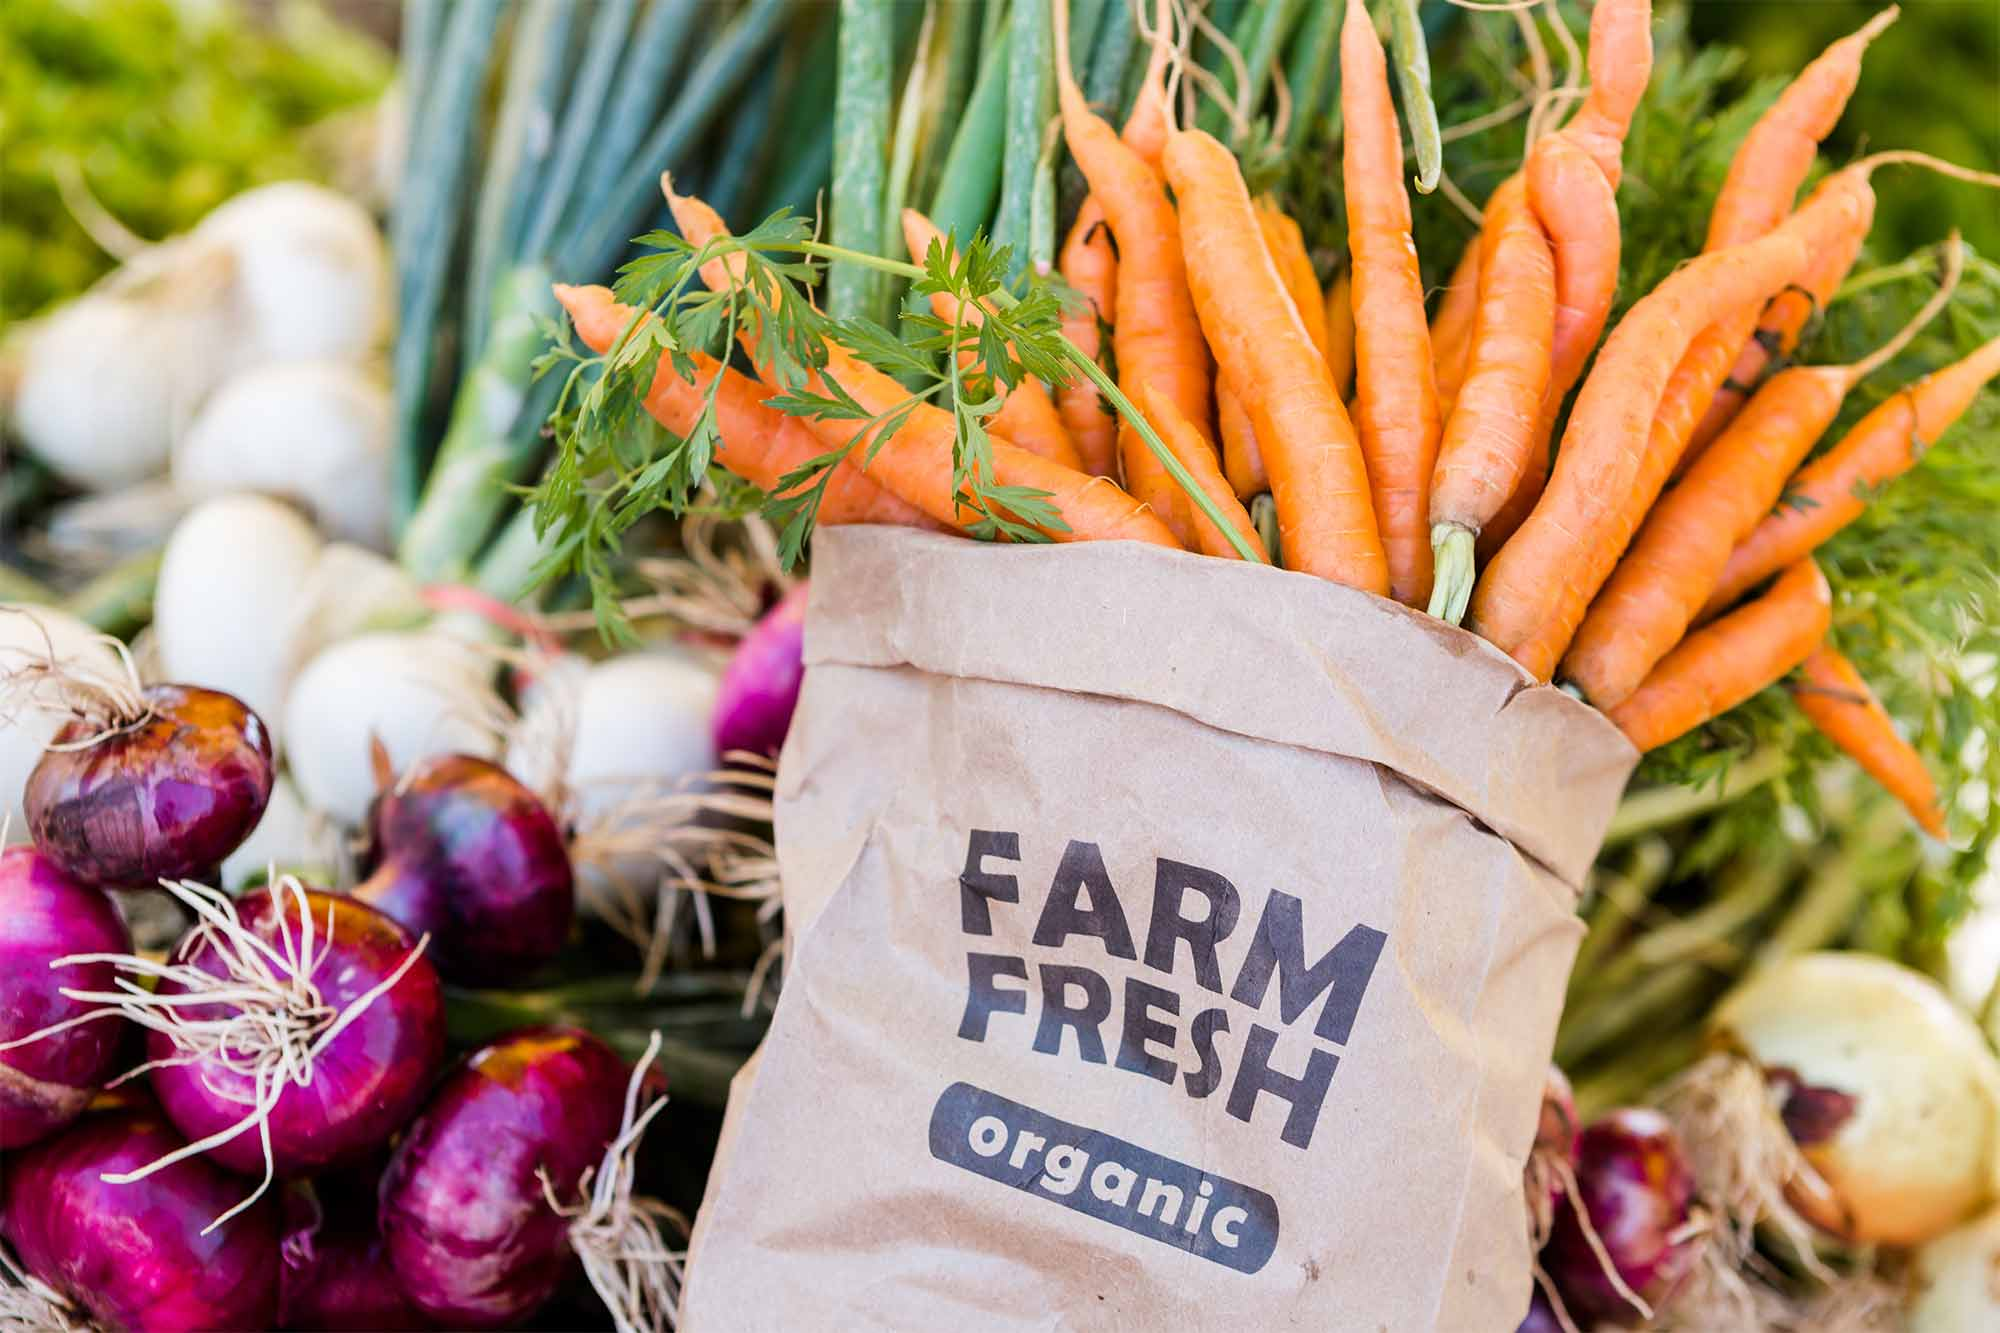 seasonal produce guides for each fruit & vegetable